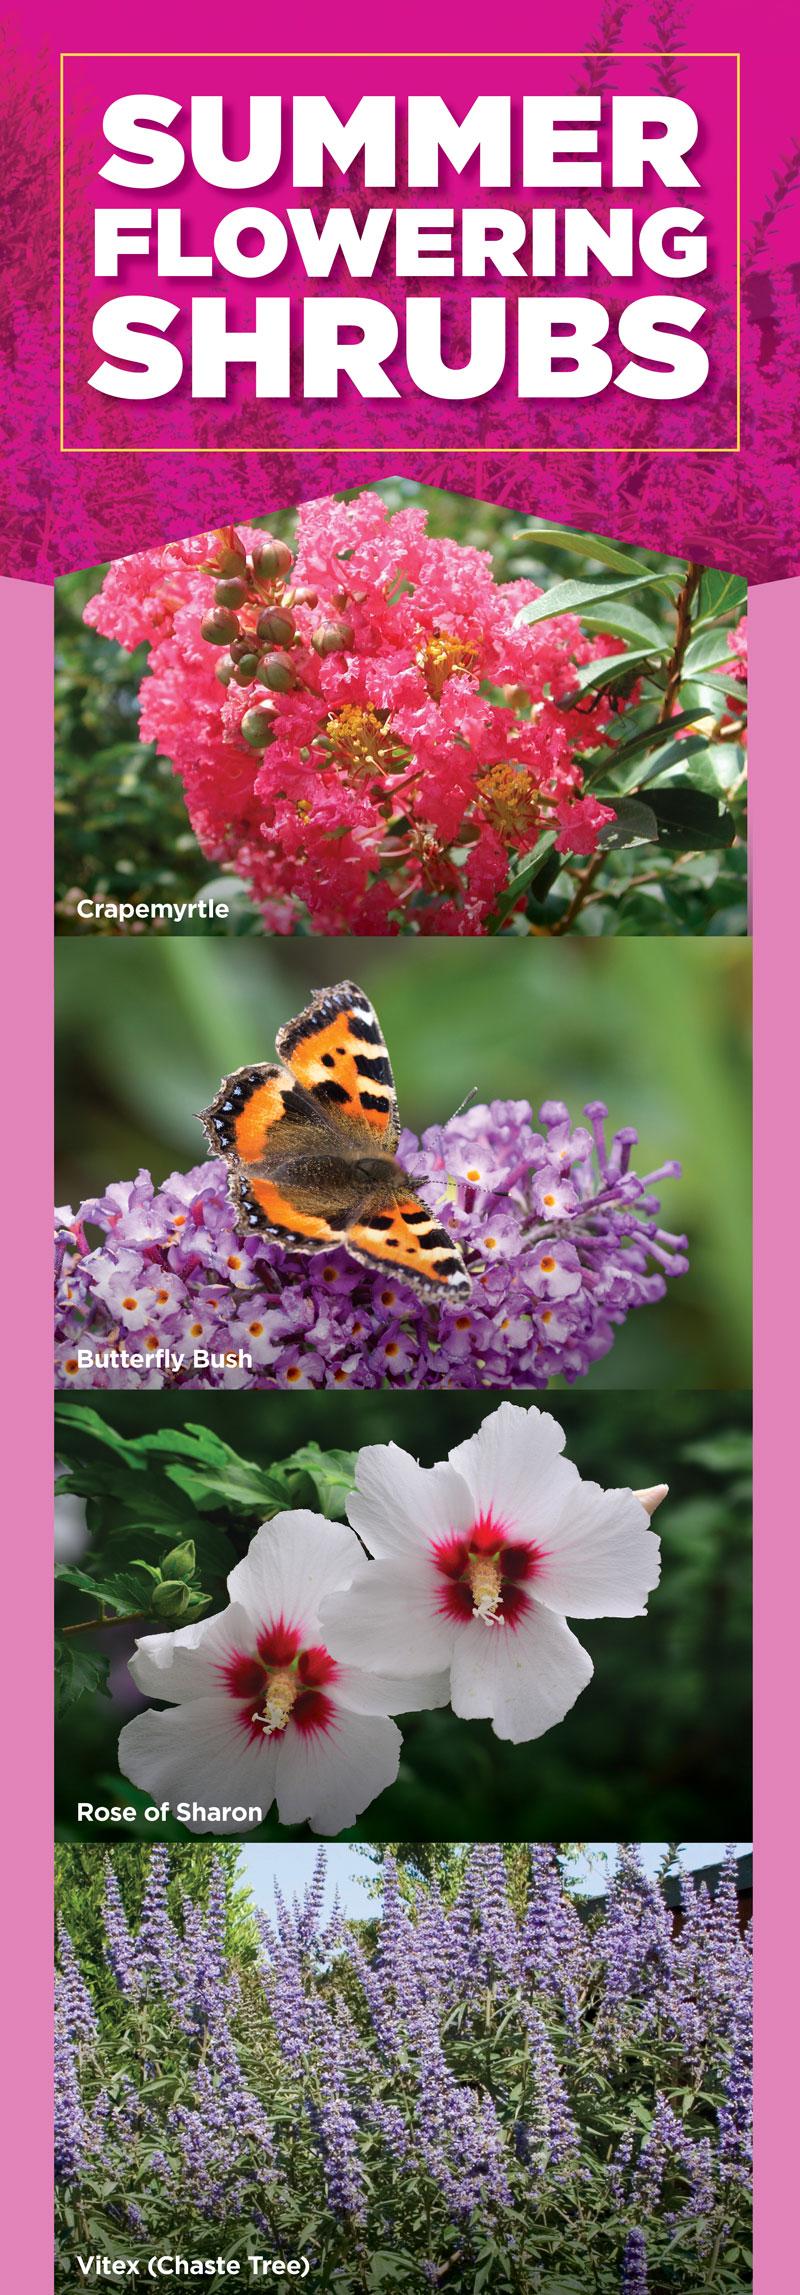 Summer Flowering Shrubs | TLC Garden Centers